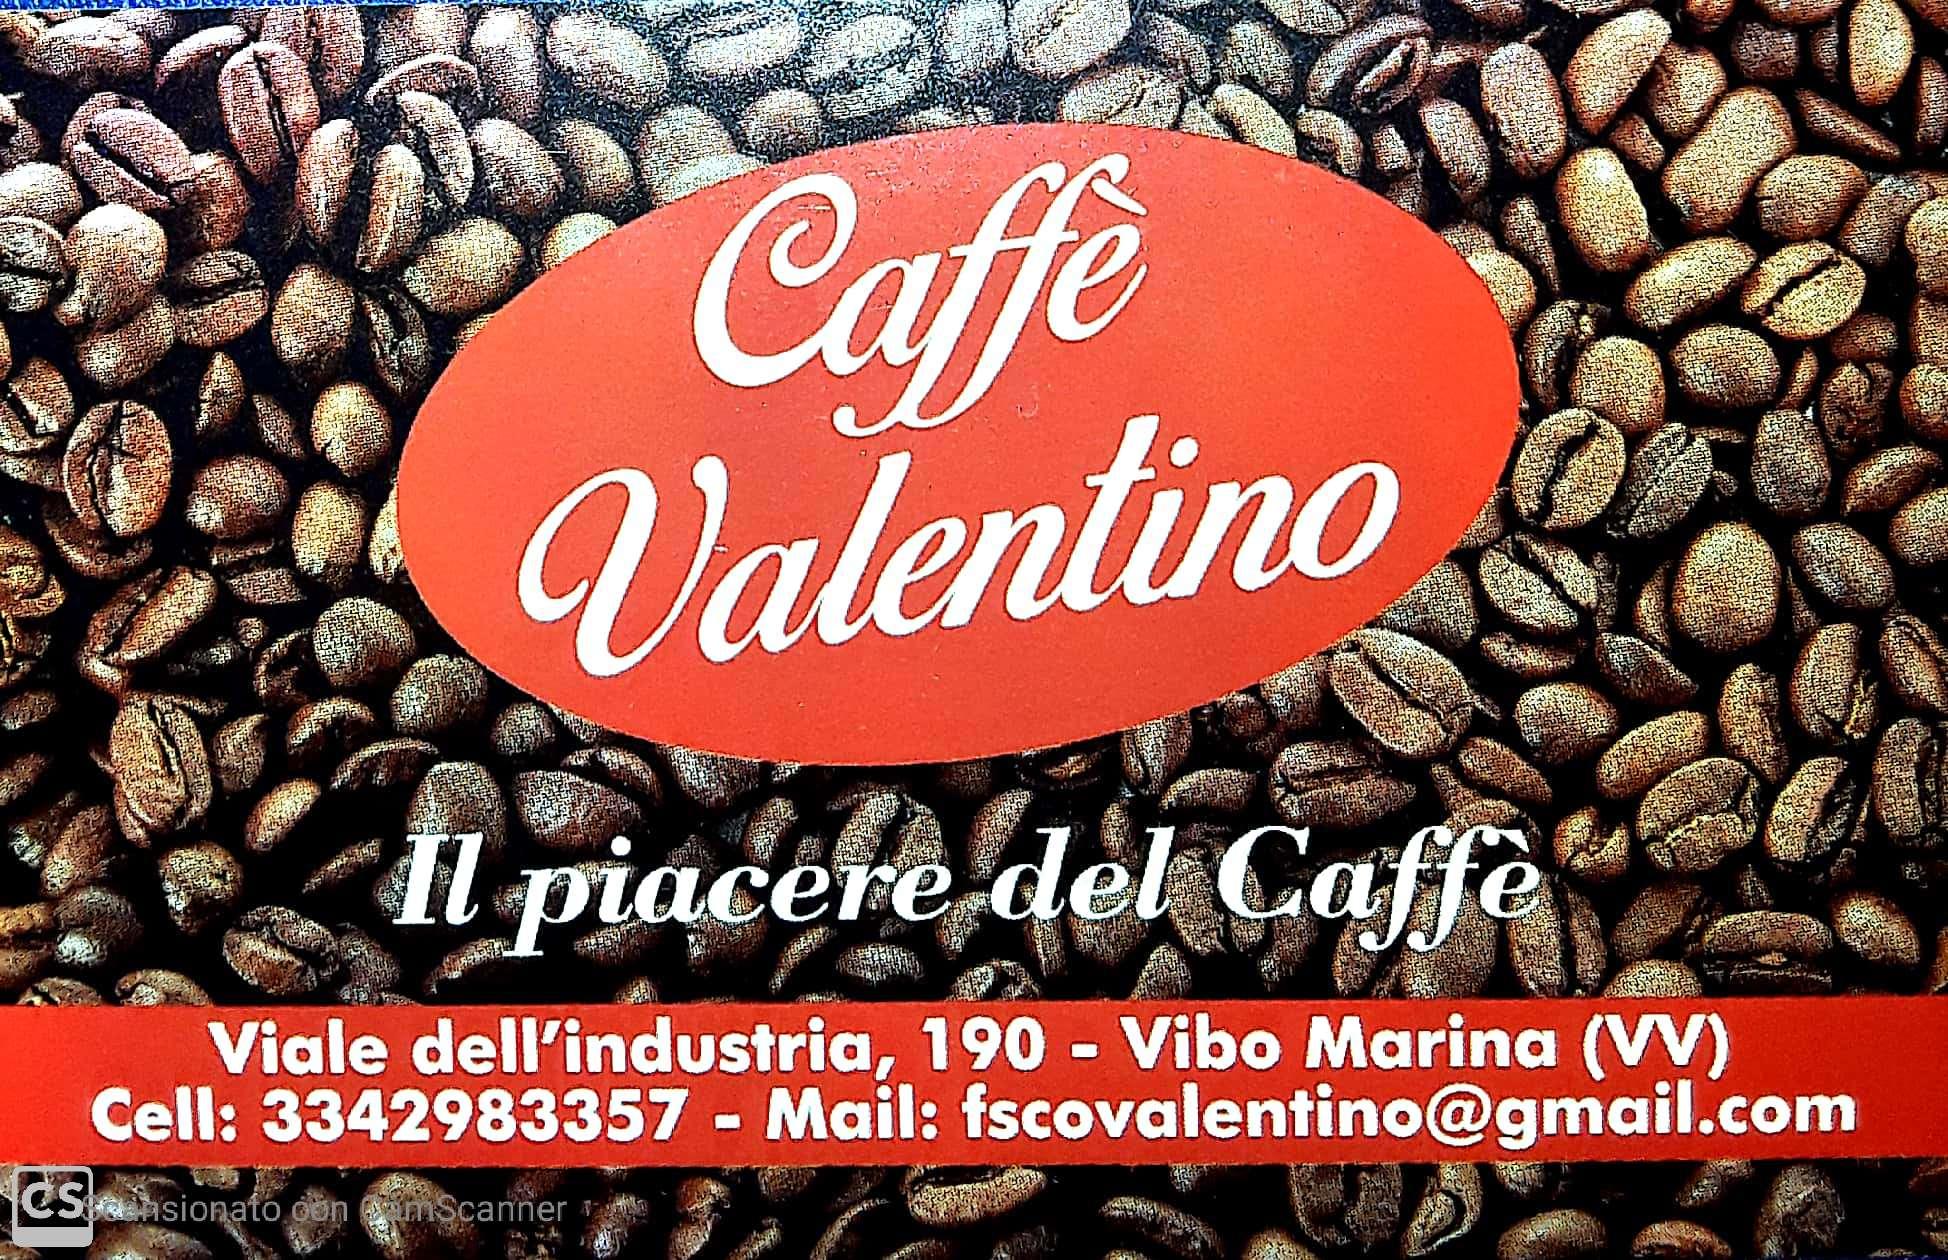 LOGO CAFFE' VALENTINO FRONTE